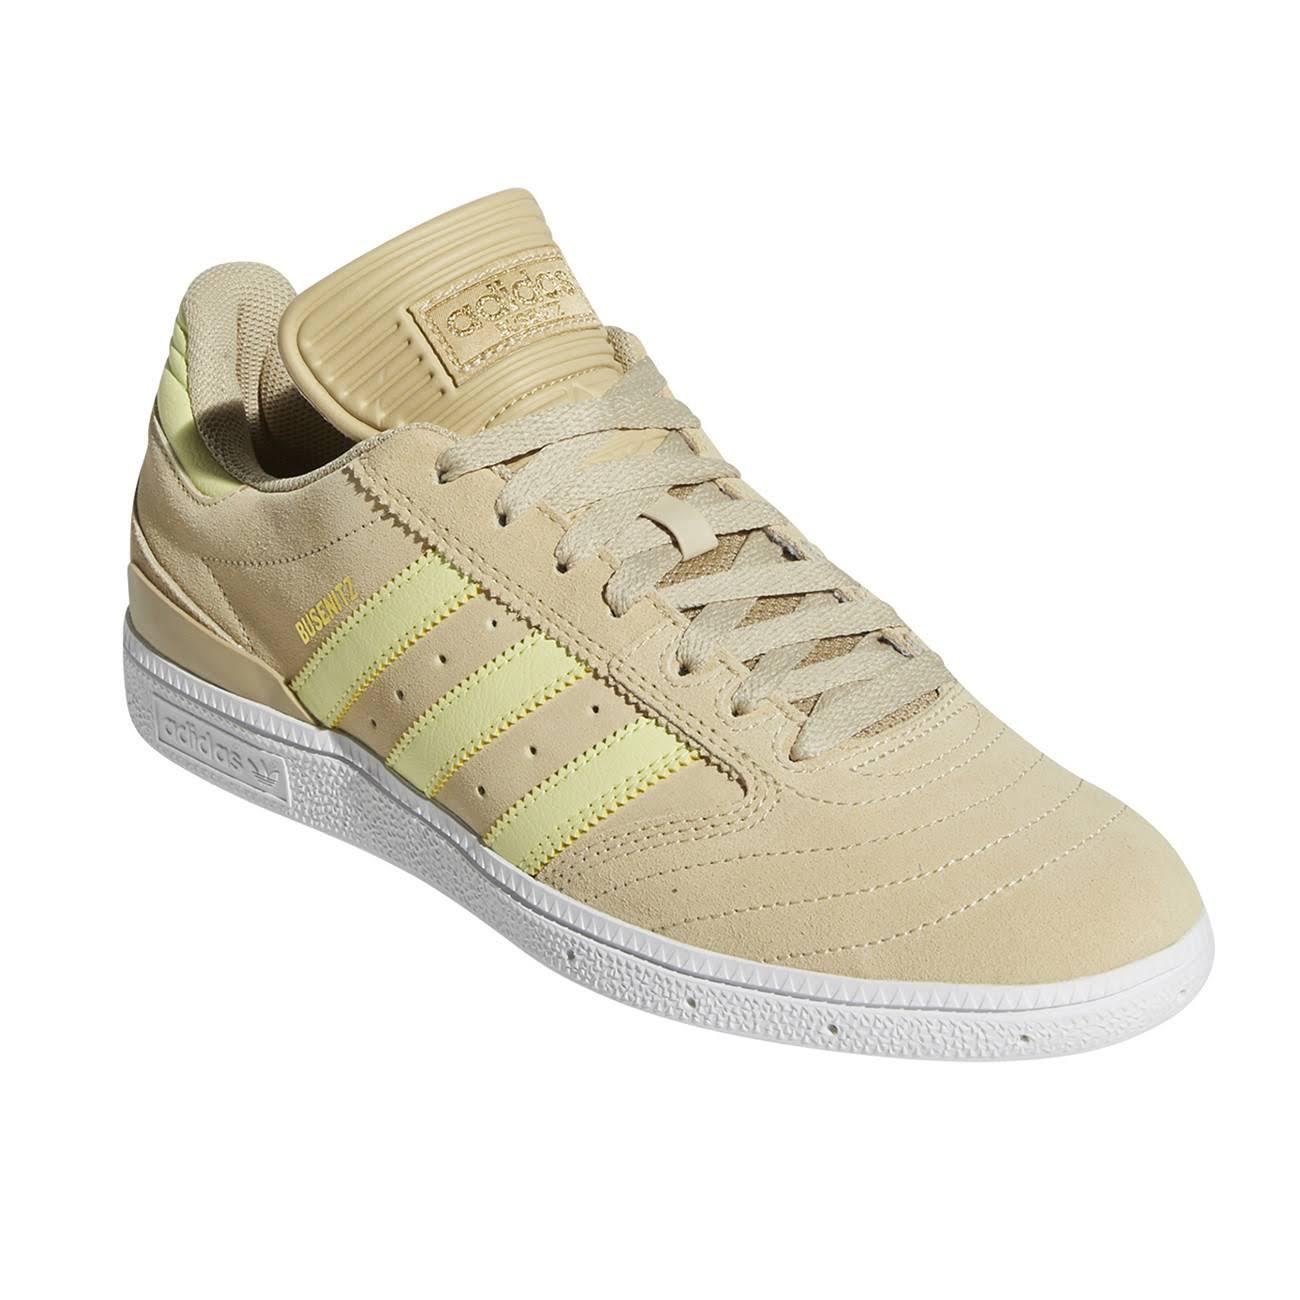 Adidas Busenitz Shoes - Savannah / Yellow Tint / White